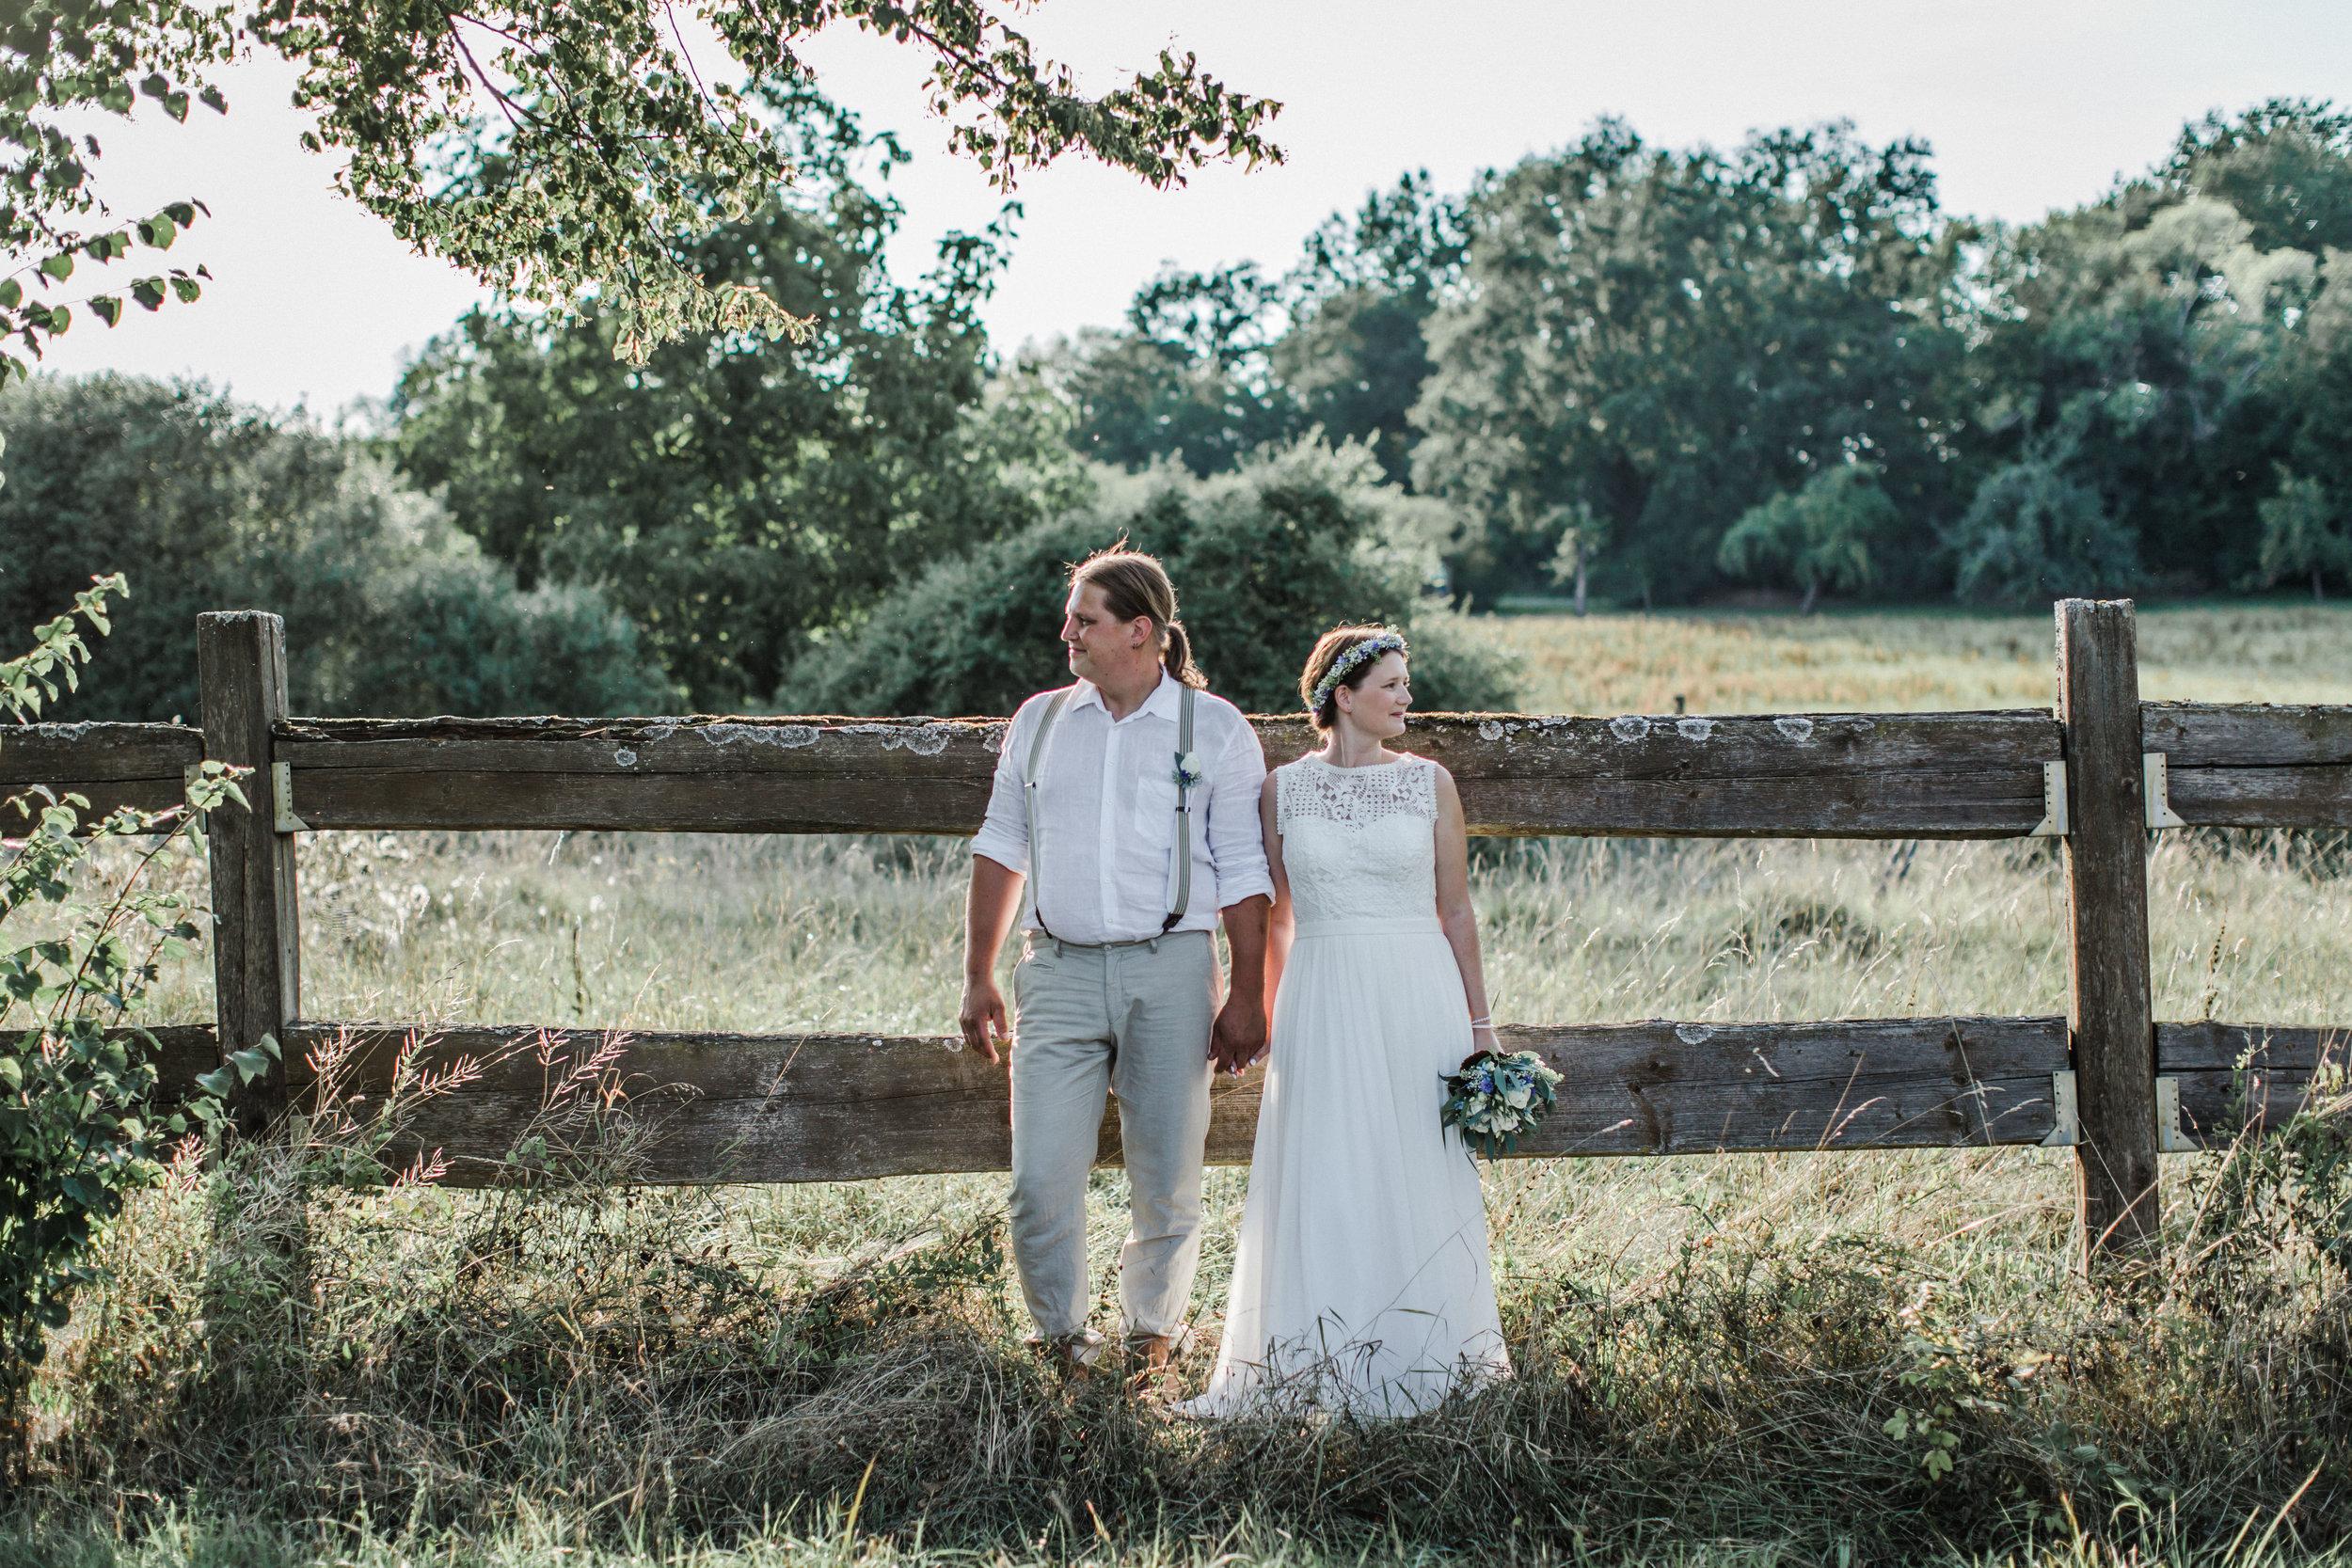 yessica-baur-fotografie-after-wedding-tübingen-034-9107.JPG